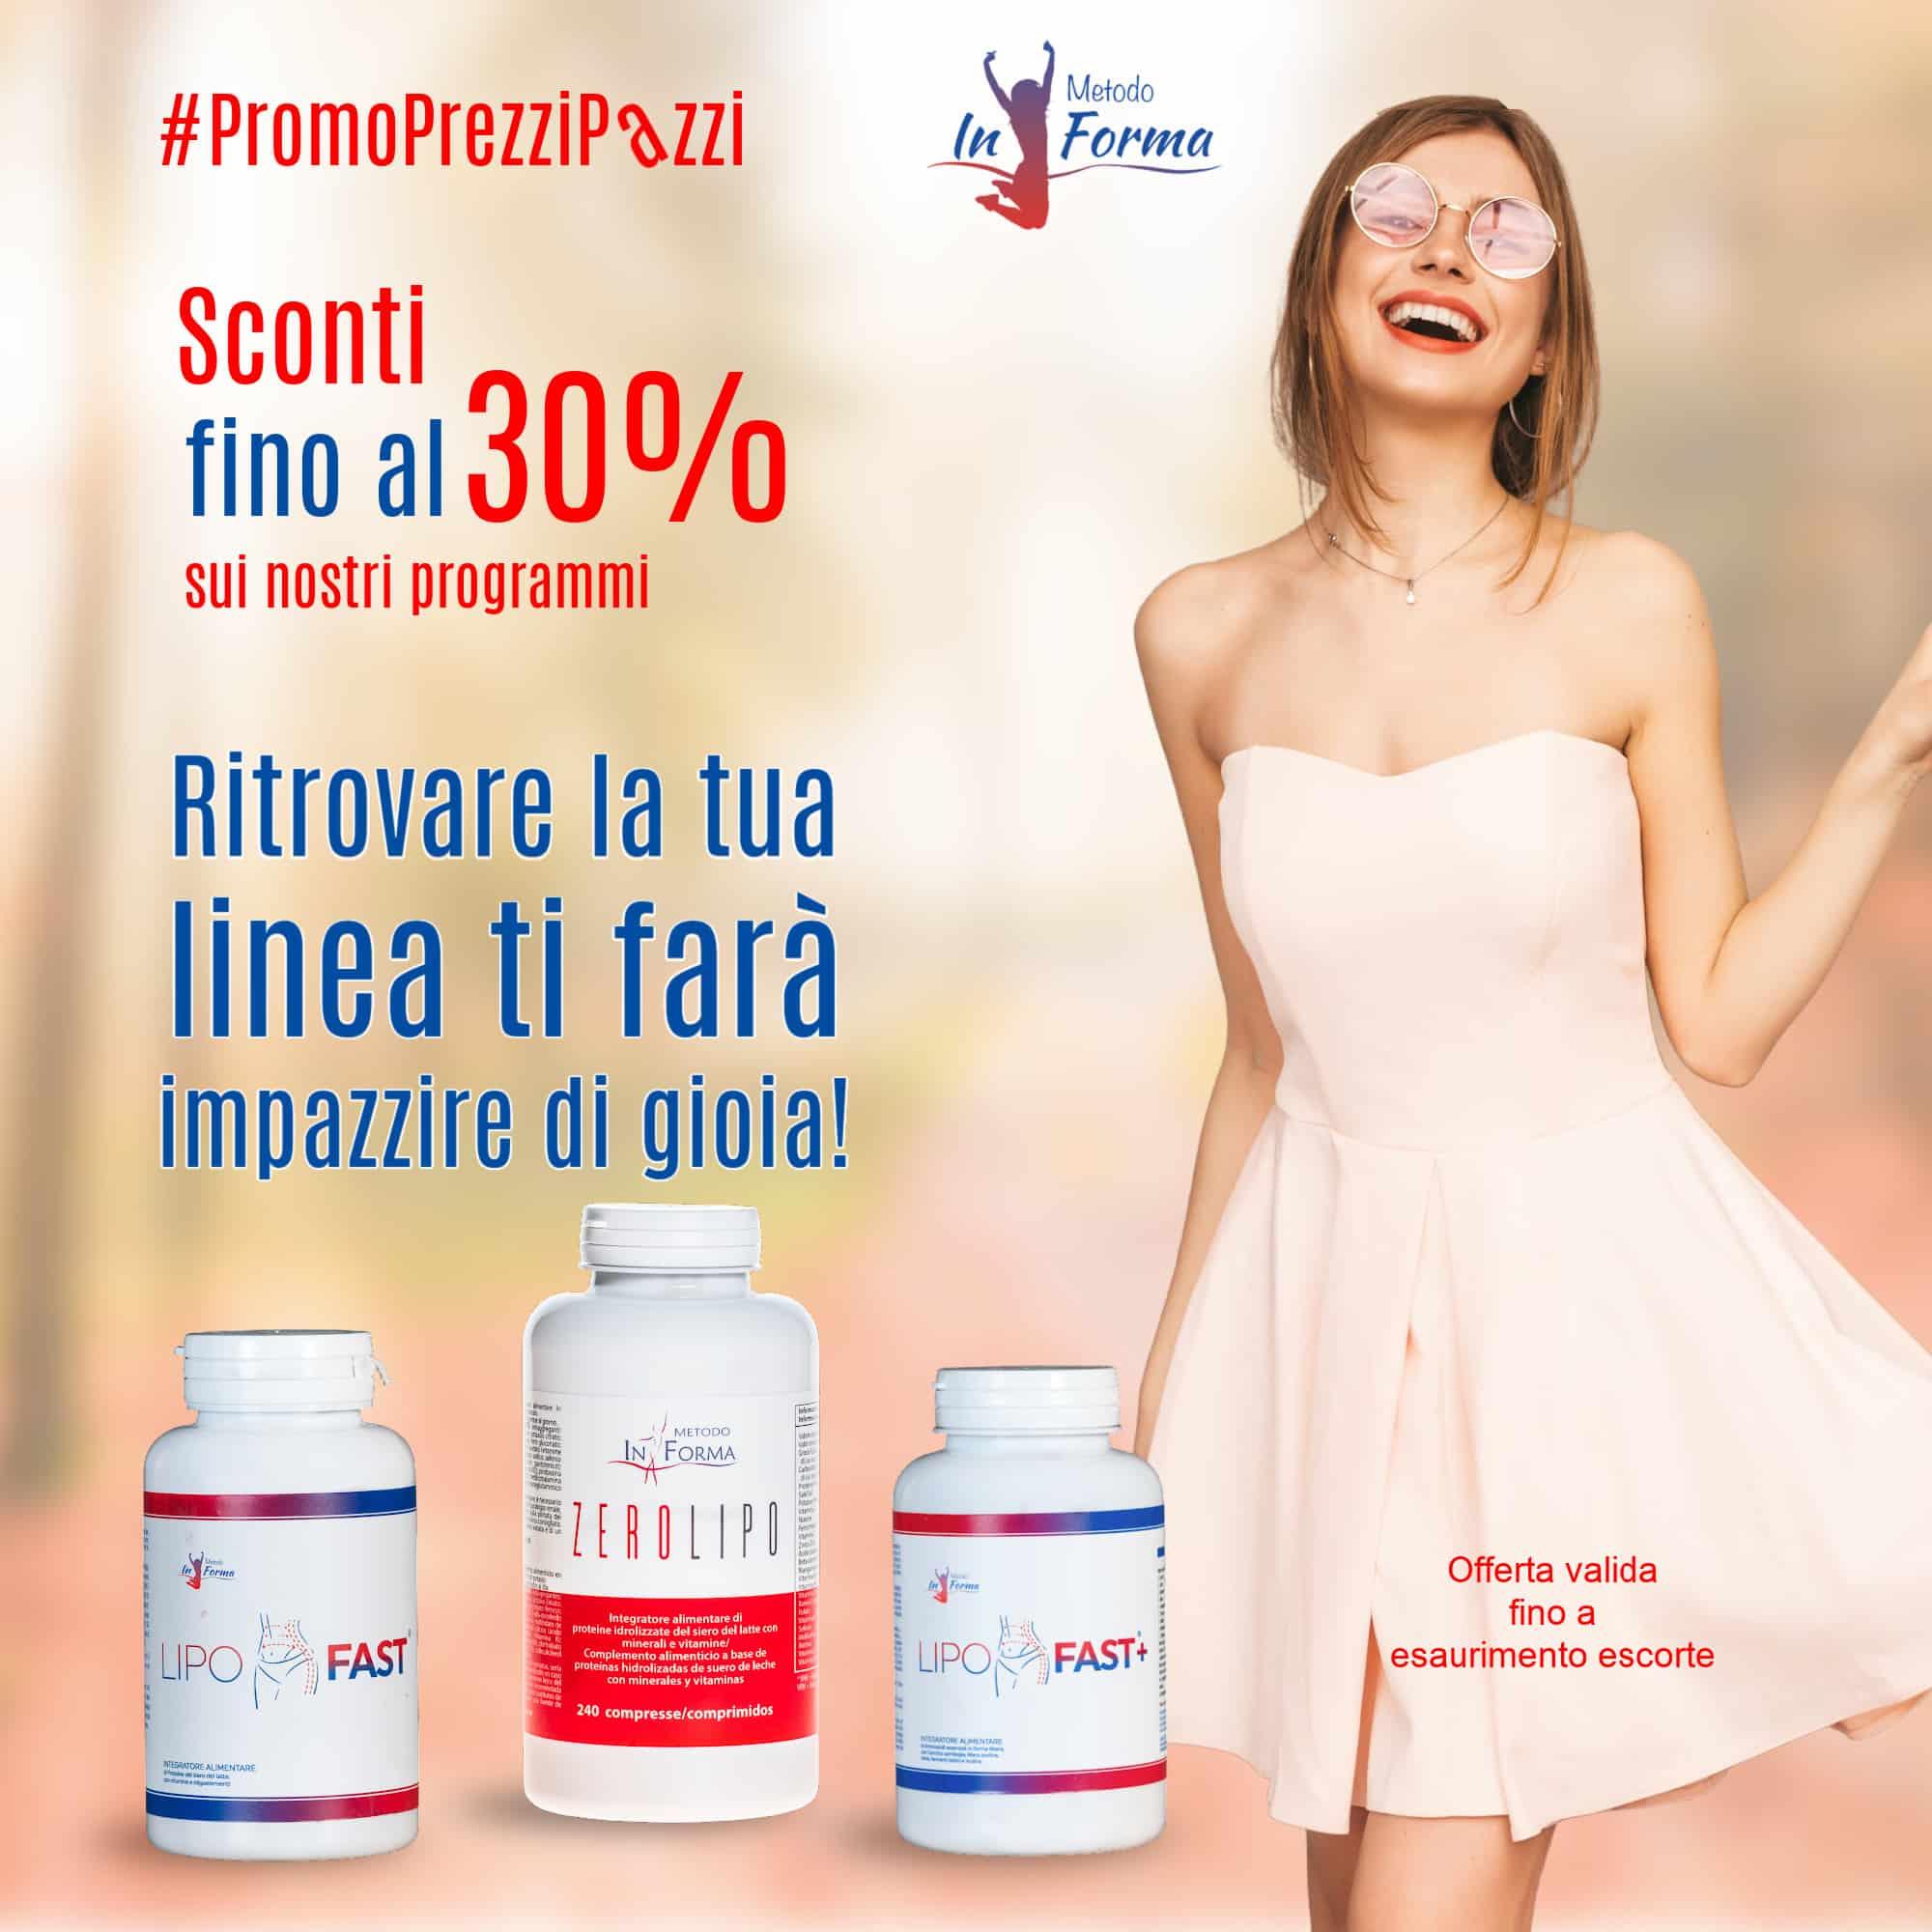 #PromoPrezziPazzi d'Autunno | Metodo InForma